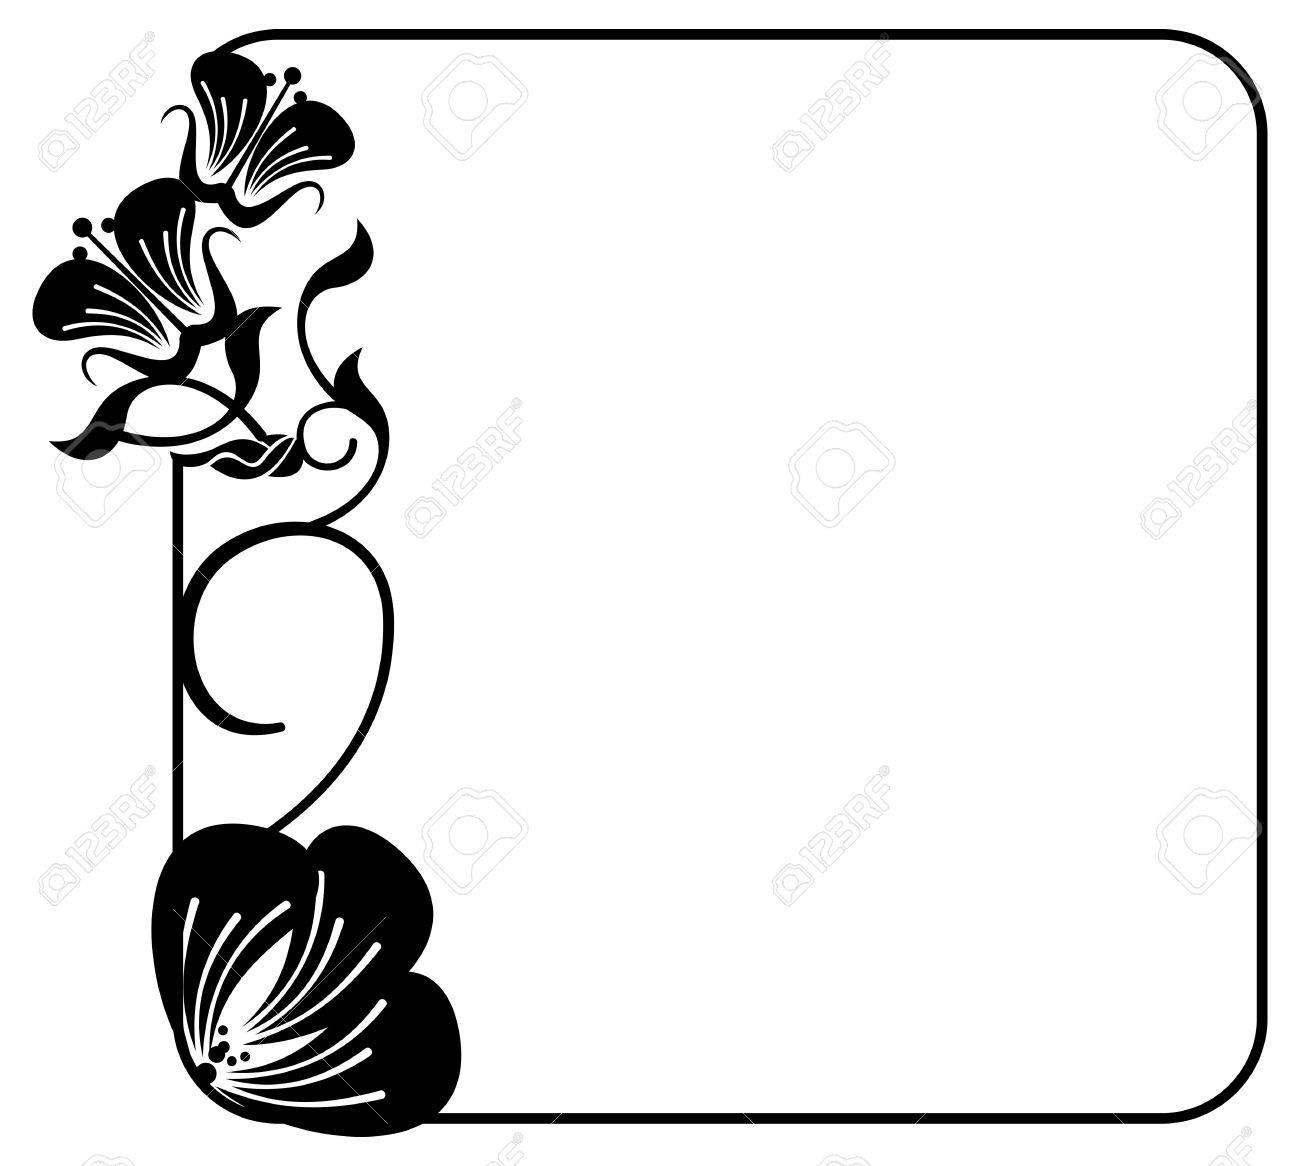 Square silhouette flower frame simple black and white frame square silhouette flower frame simple black and white frame with abstract flowers stock vector mightylinksfo